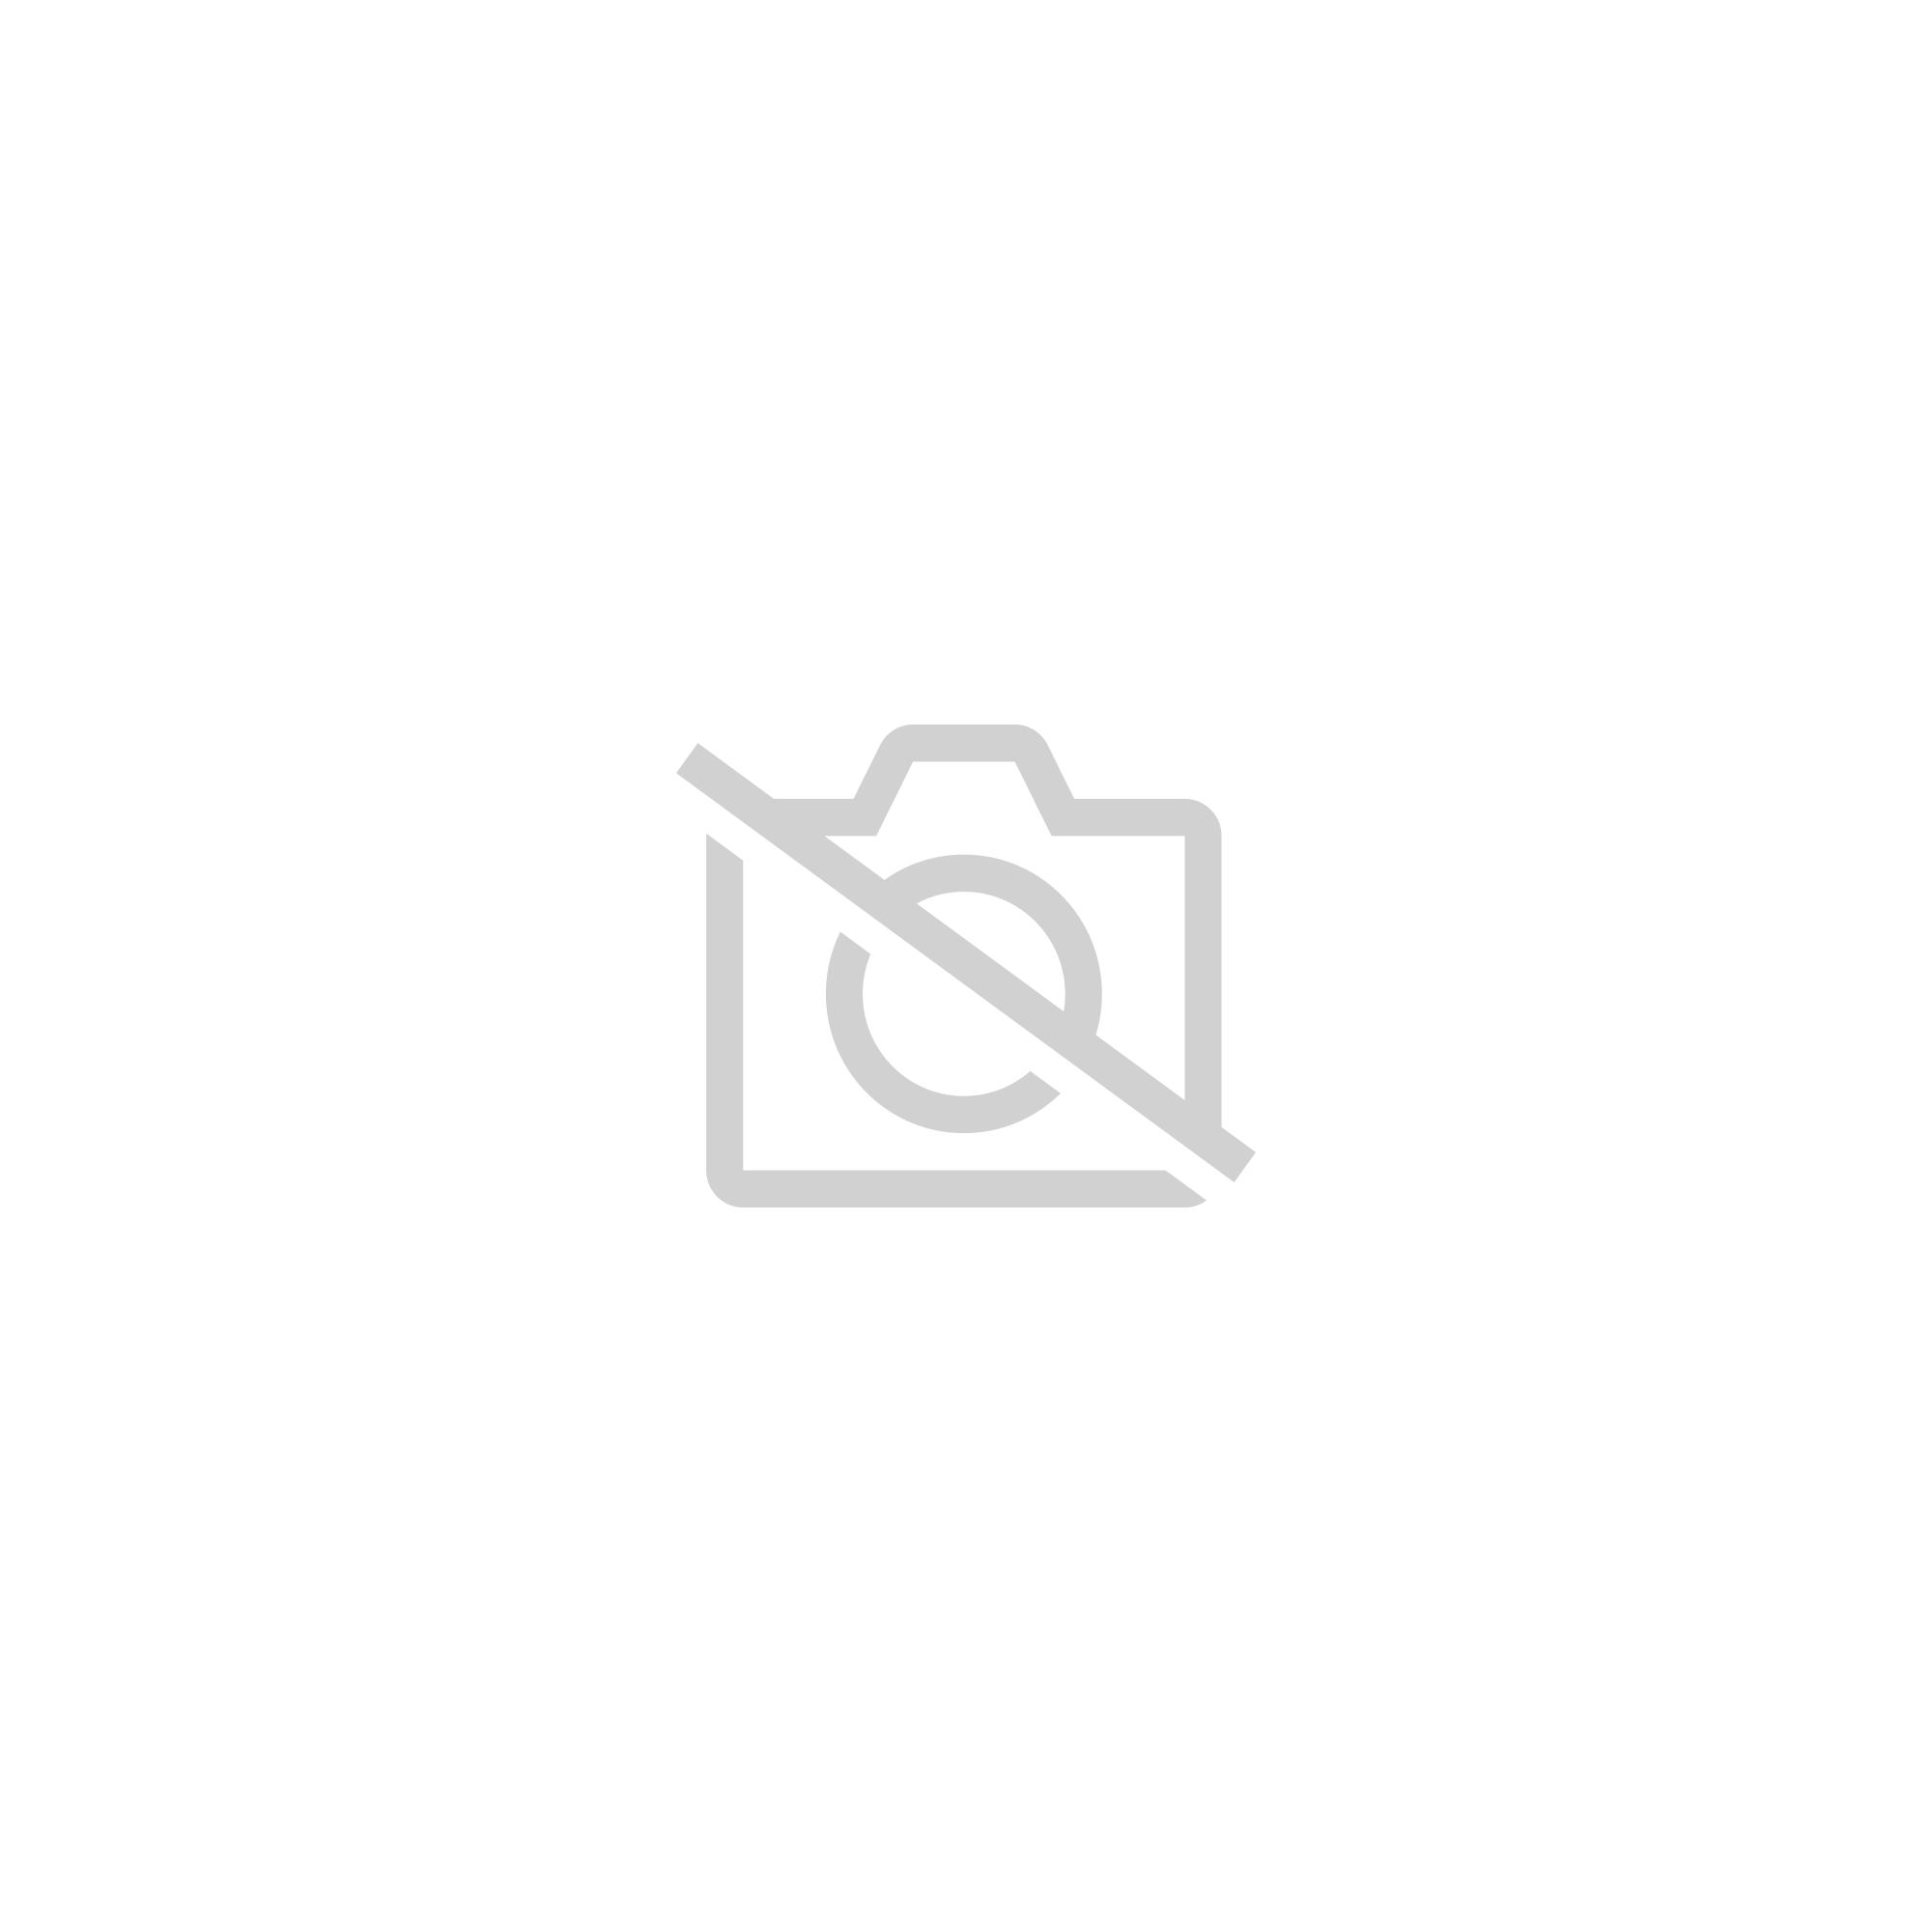 Lexmark Cartridge No. 90 - Cartouche d'impression (photo) - 1 x noir, jaune, cyan, magenta, magenta clair, cyan clair -